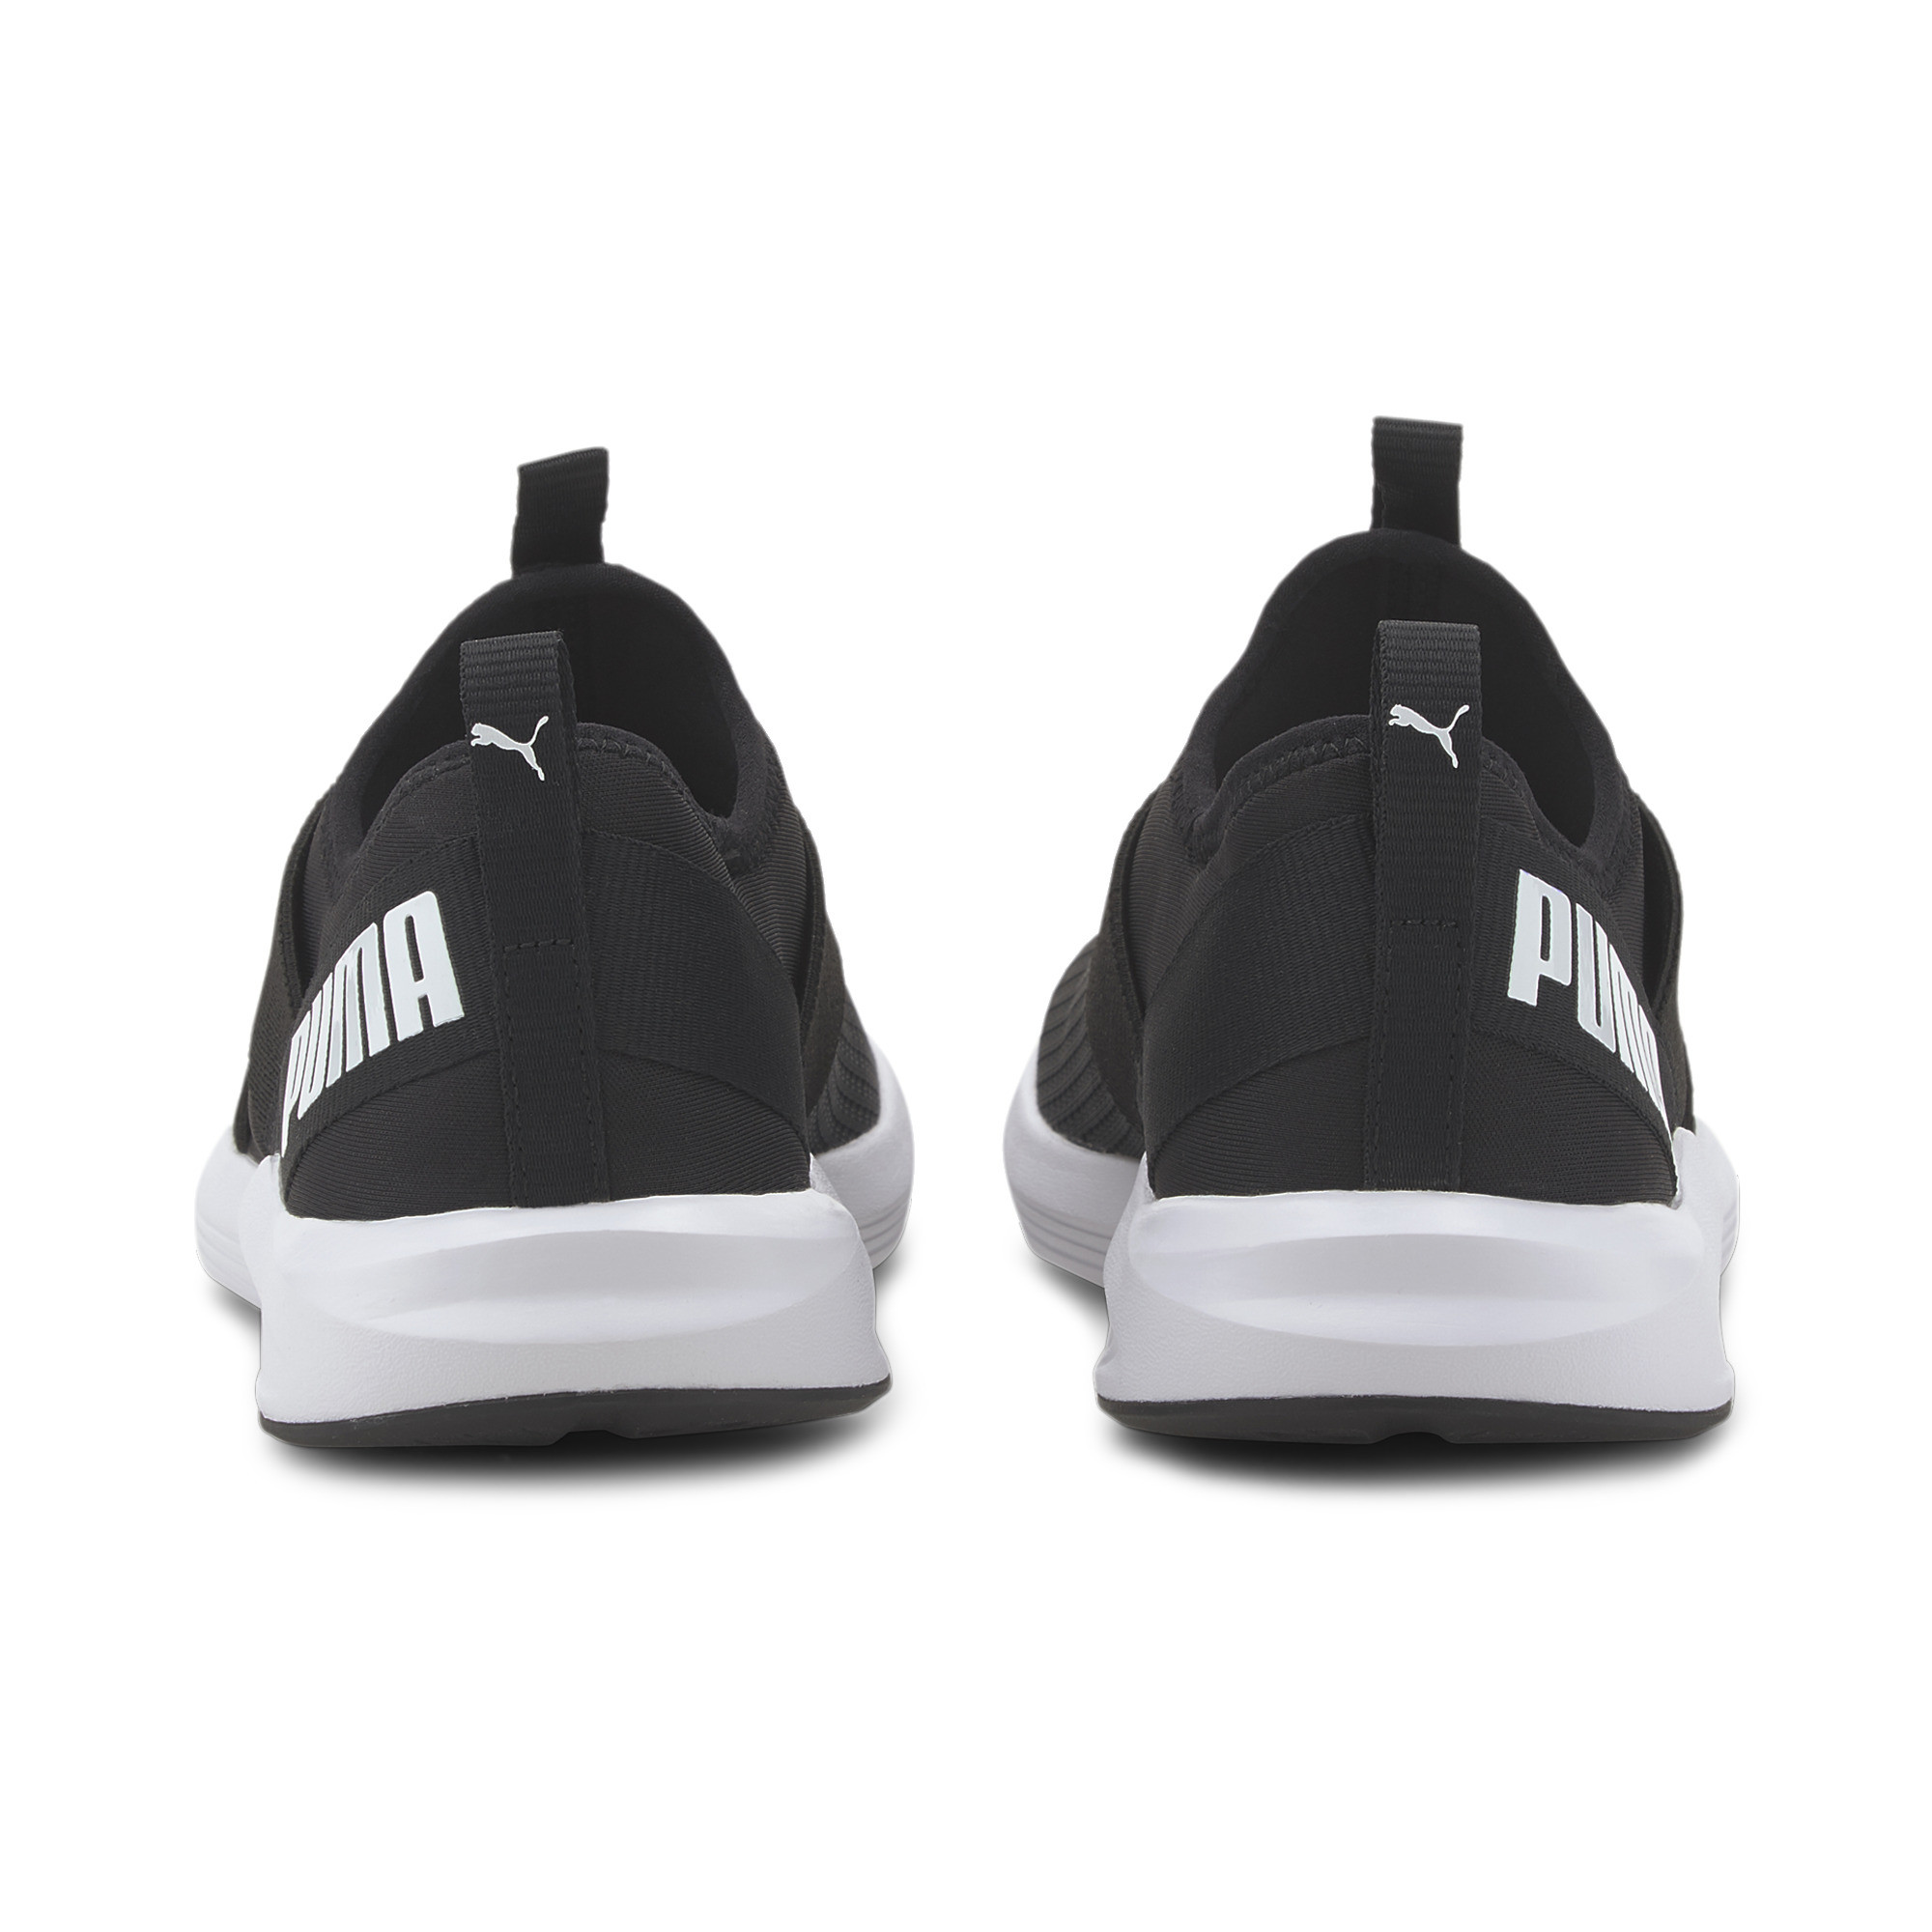 thumbnail 14 - PUMA Women's Prowl Slip On Training Shoes